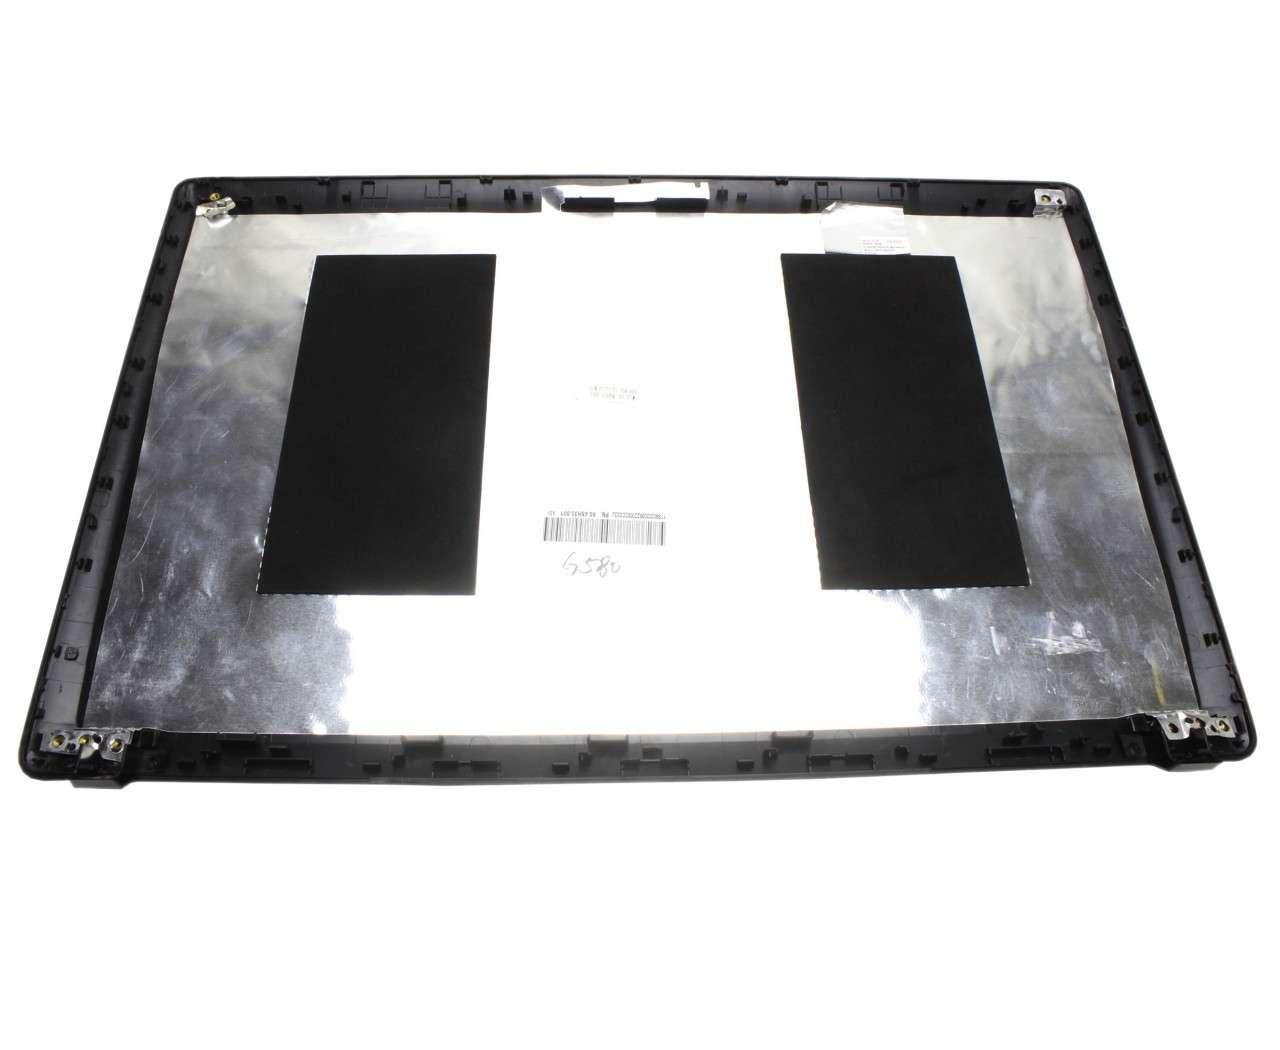 Capac Display BackCover Lenovo 90200985 Carcasa Display Neagra Varianta 1 imagine powerlaptop.ro 2021